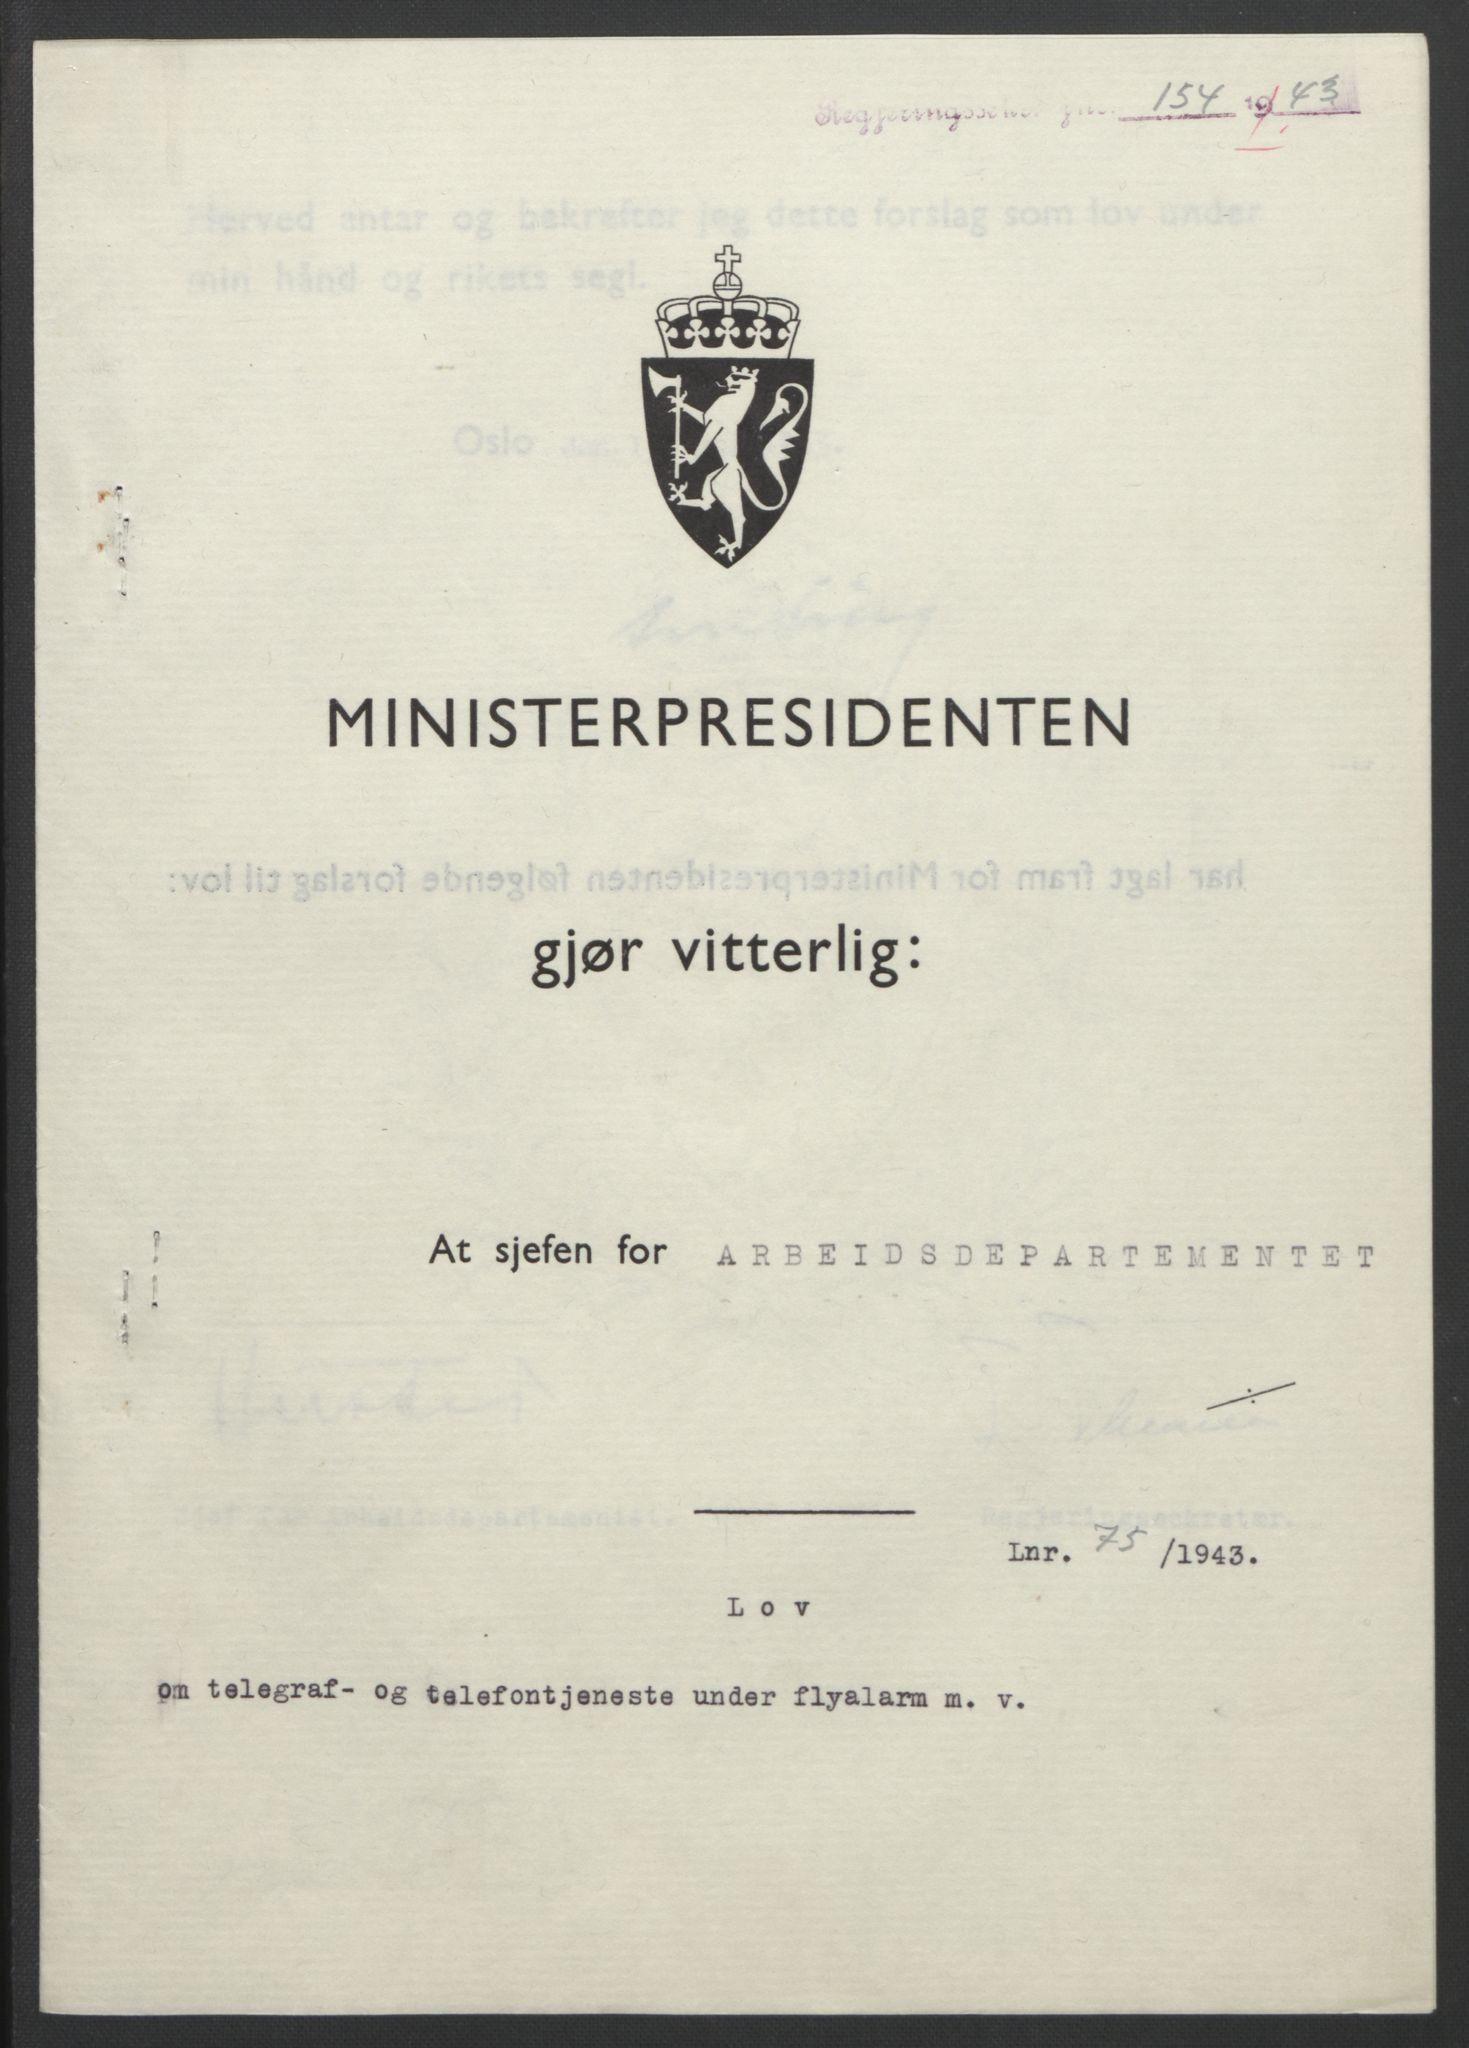 RA, NS-administrasjonen 1940-1945 (Statsrådsekretariatet, de kommisariske statsråder mm), D/Db/L0099: Lover, 1943, s. 345